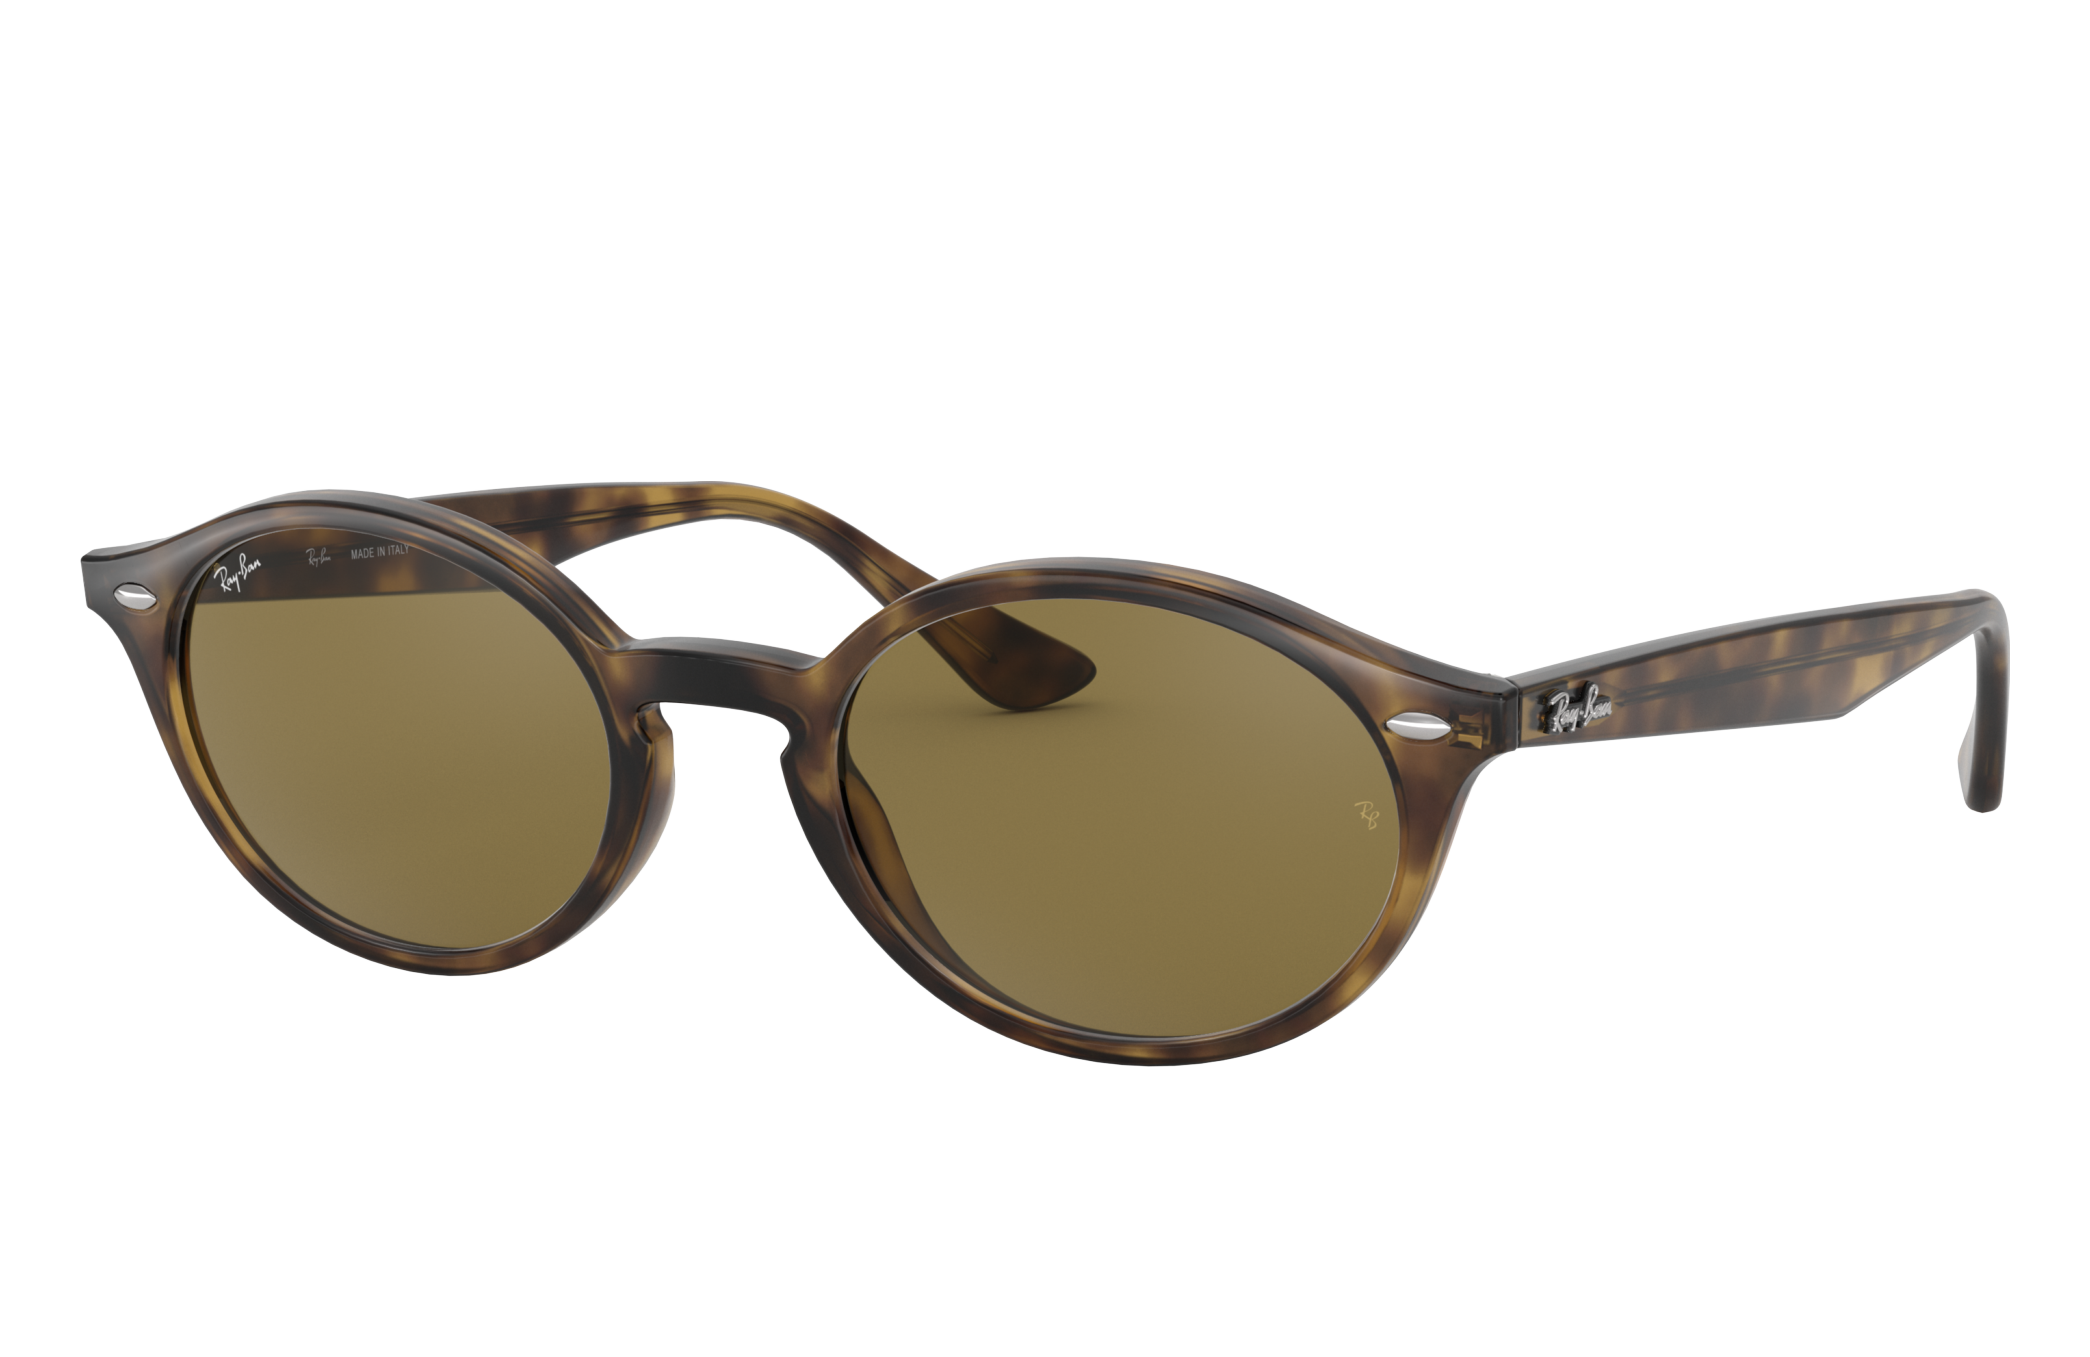 Ray-Ban Rb4315 Tortoise, Brown Lenses - RB4315